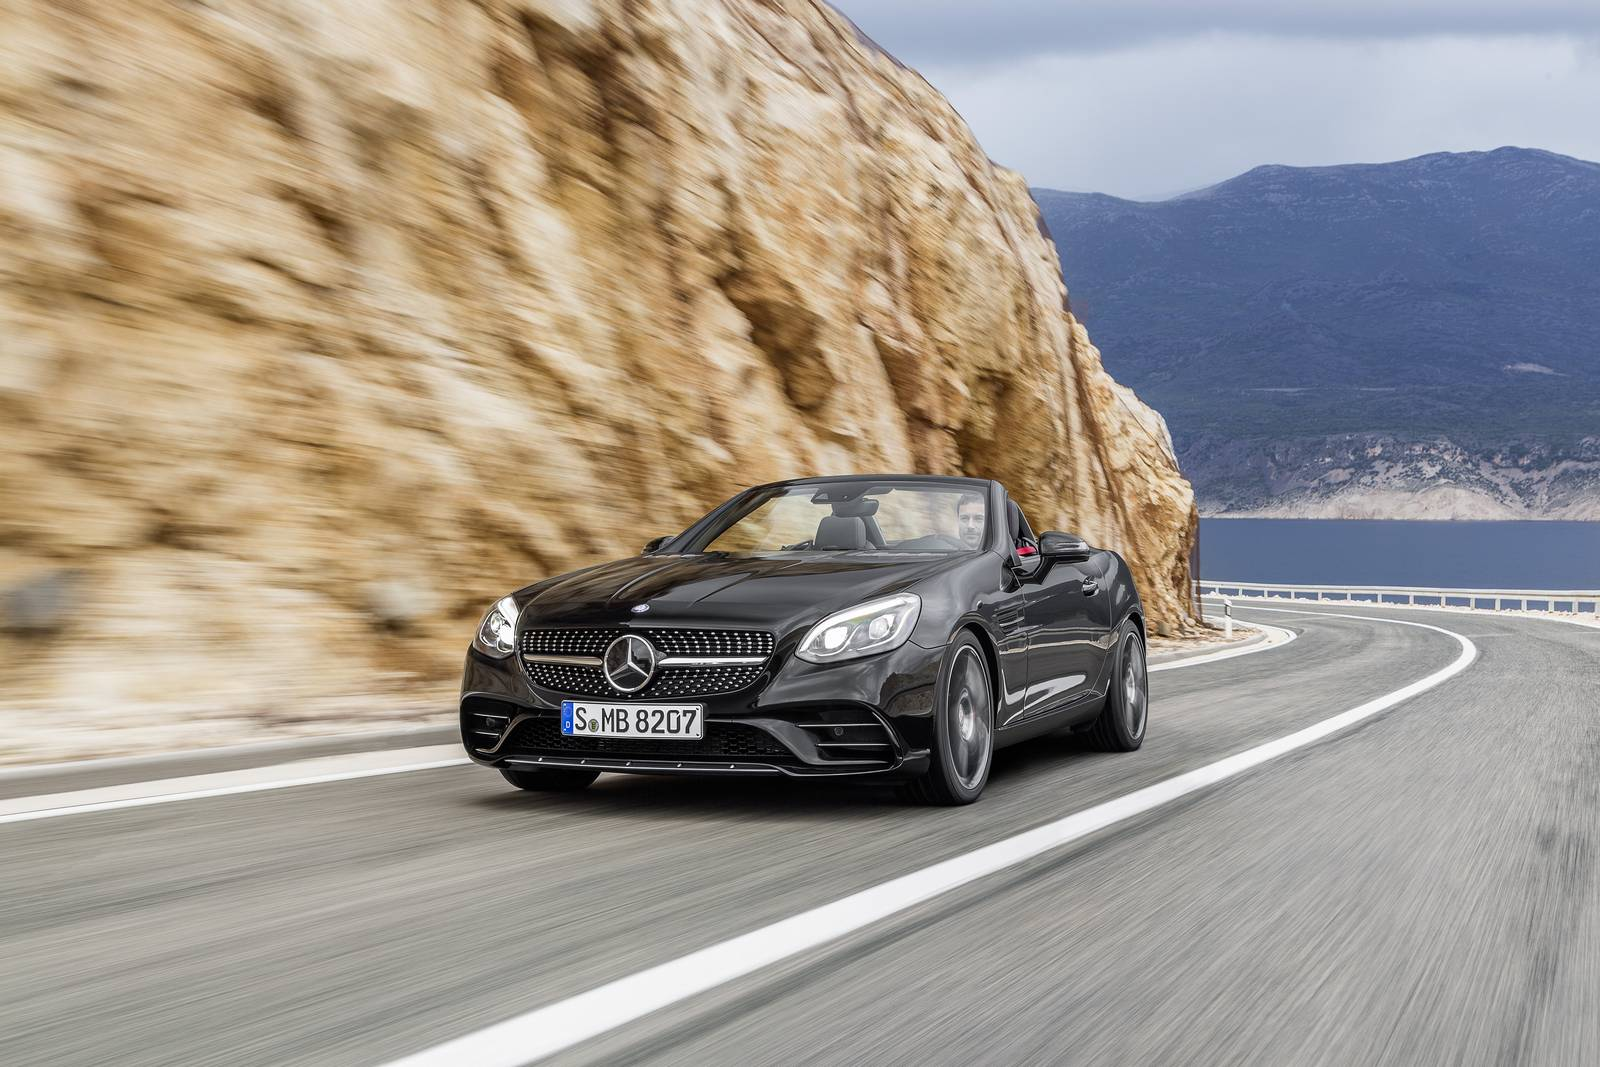 https://storage.googleapis.com/gtspirit/uploads/2016/01/Mercedes-AMG-SLC-43-1.jpg